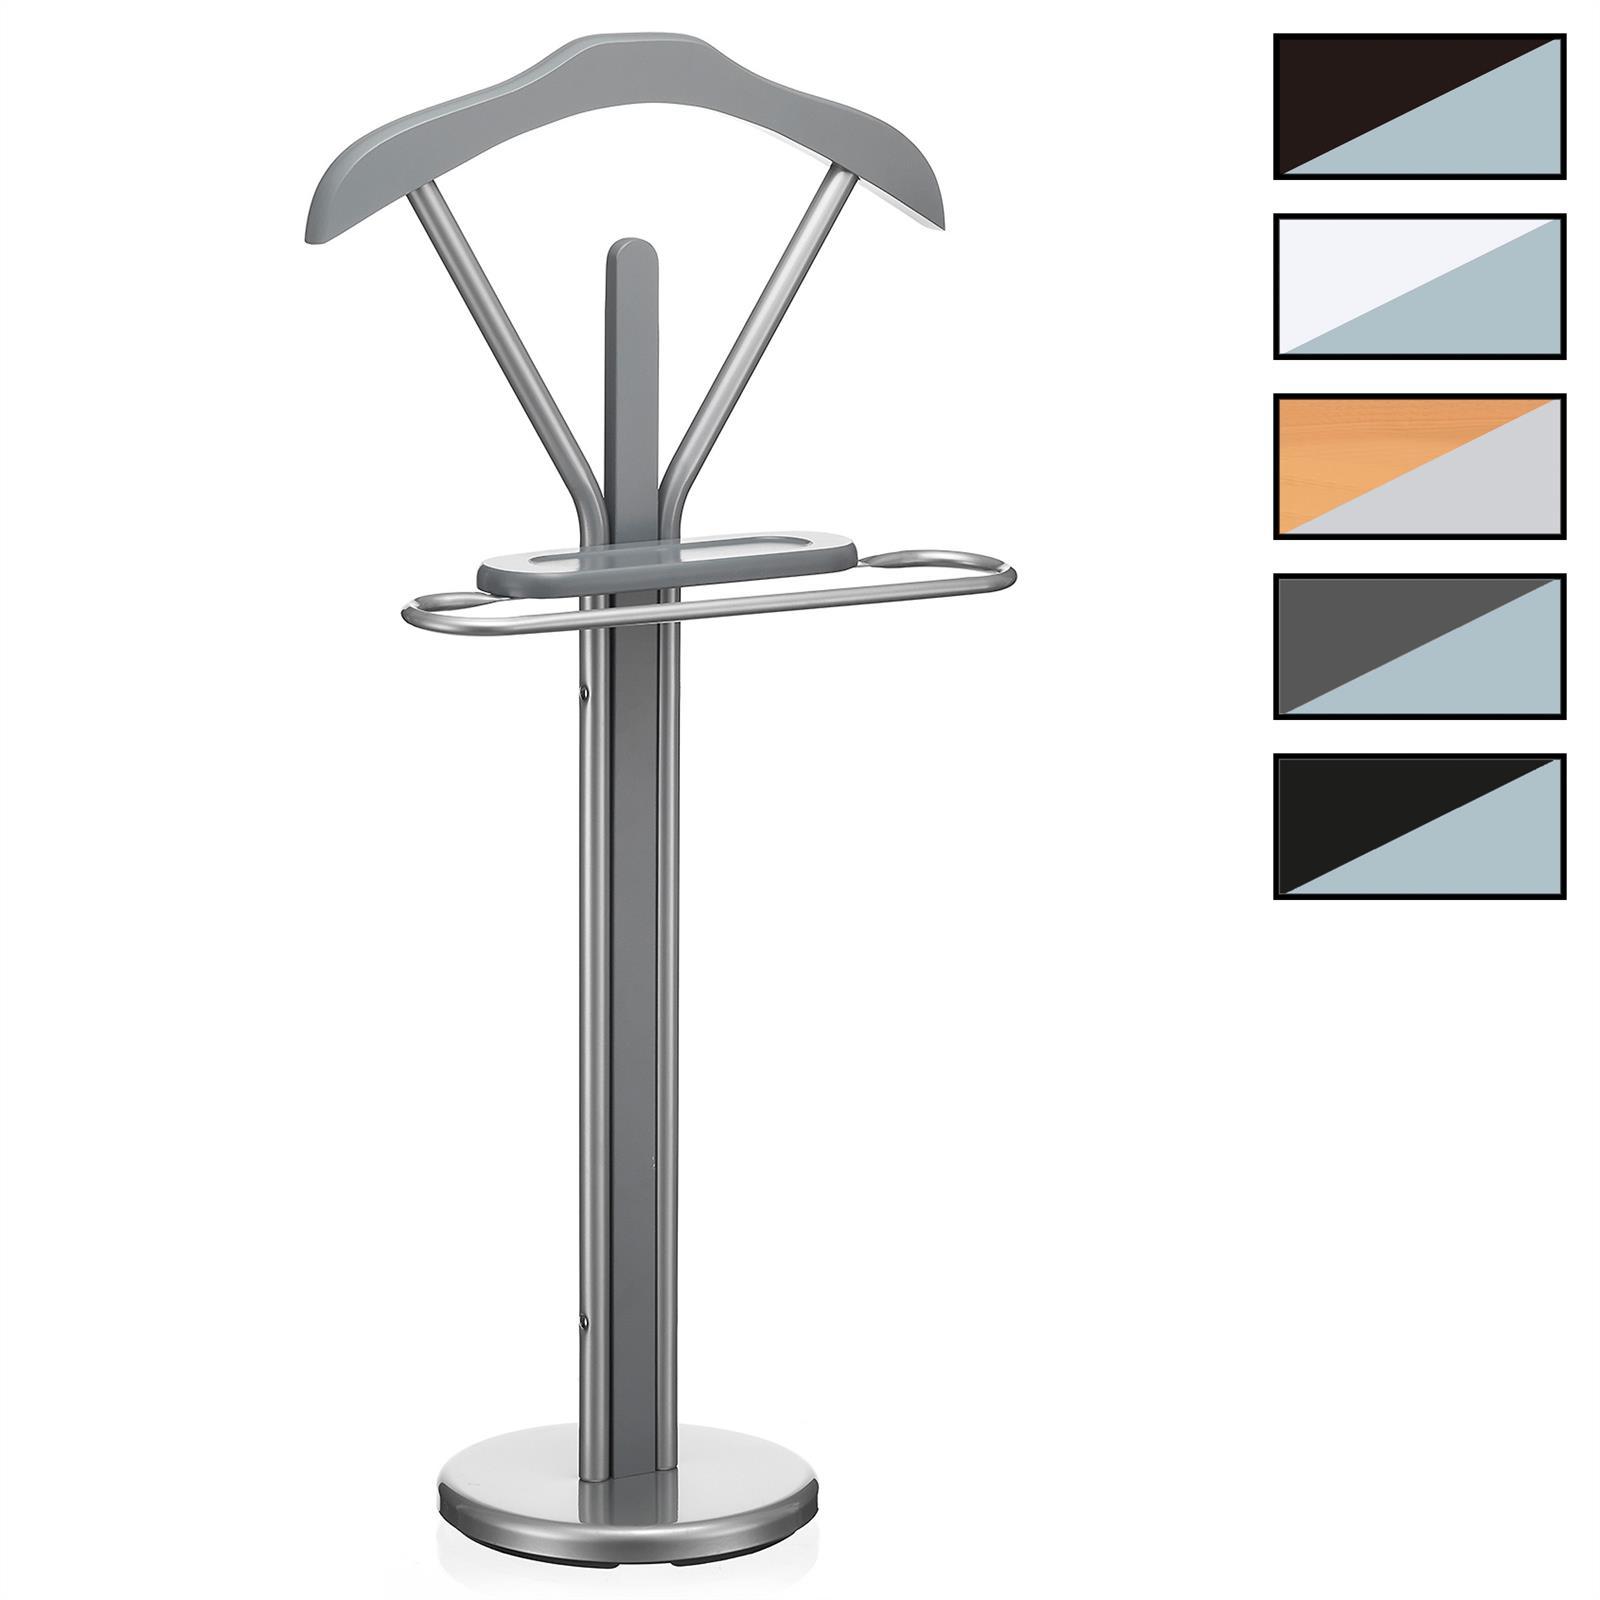 herrendiener stummer damen diener kleiderbutler kleiderb gel hosenb gel 4 farben ebay. Black Bedroom Furniture Sets. Home Design Ideas